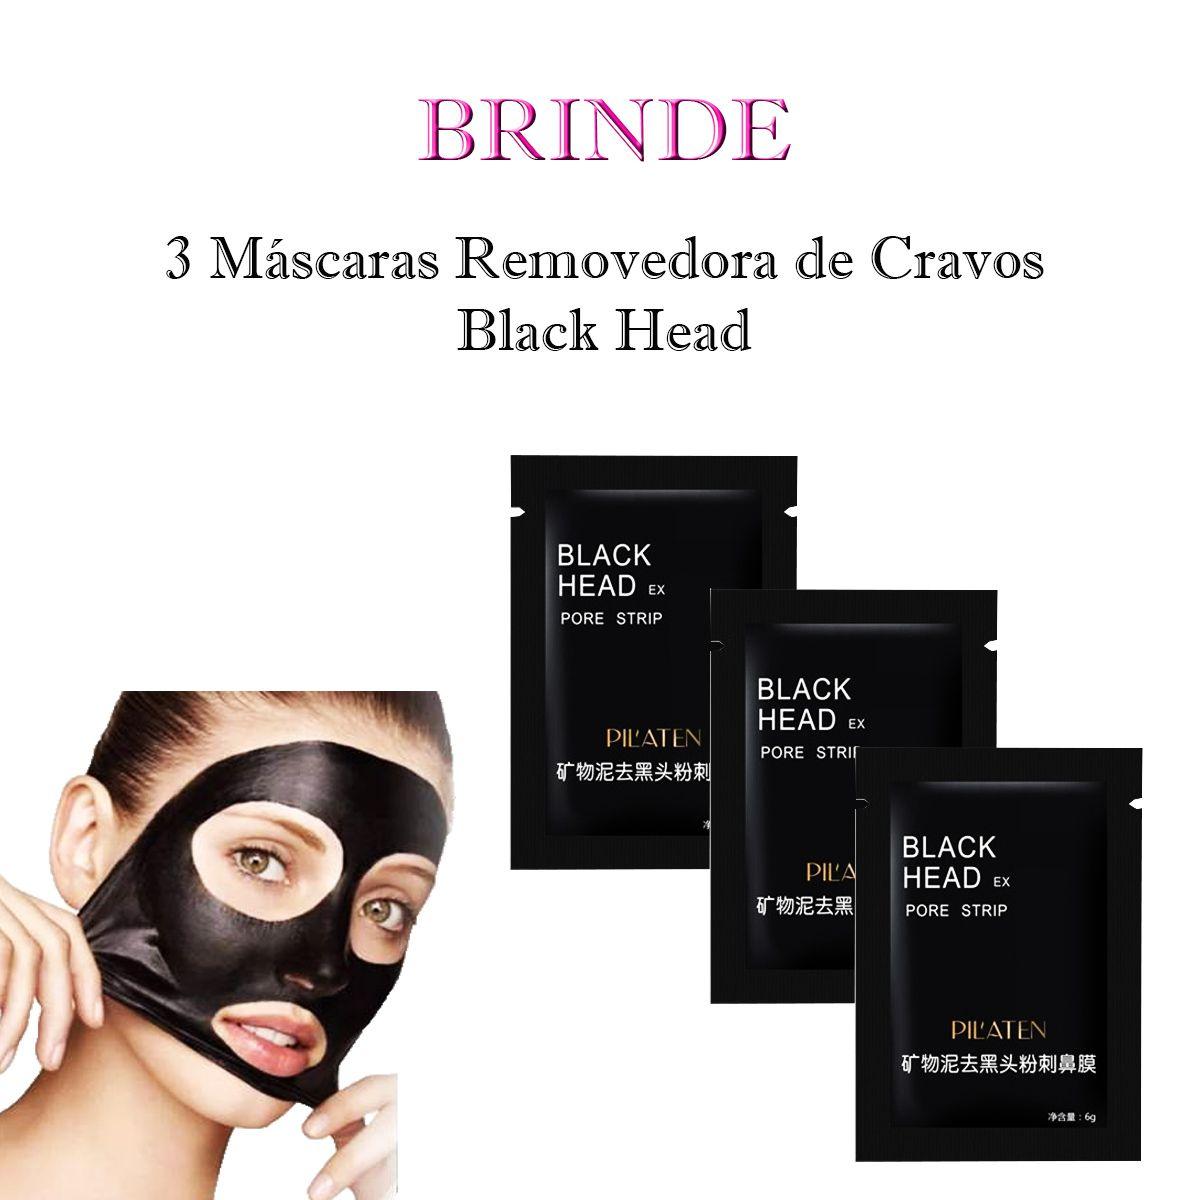 Kit Maquiagem Profissional - Paleta de Sombra Luisance Macrilan + Brinde